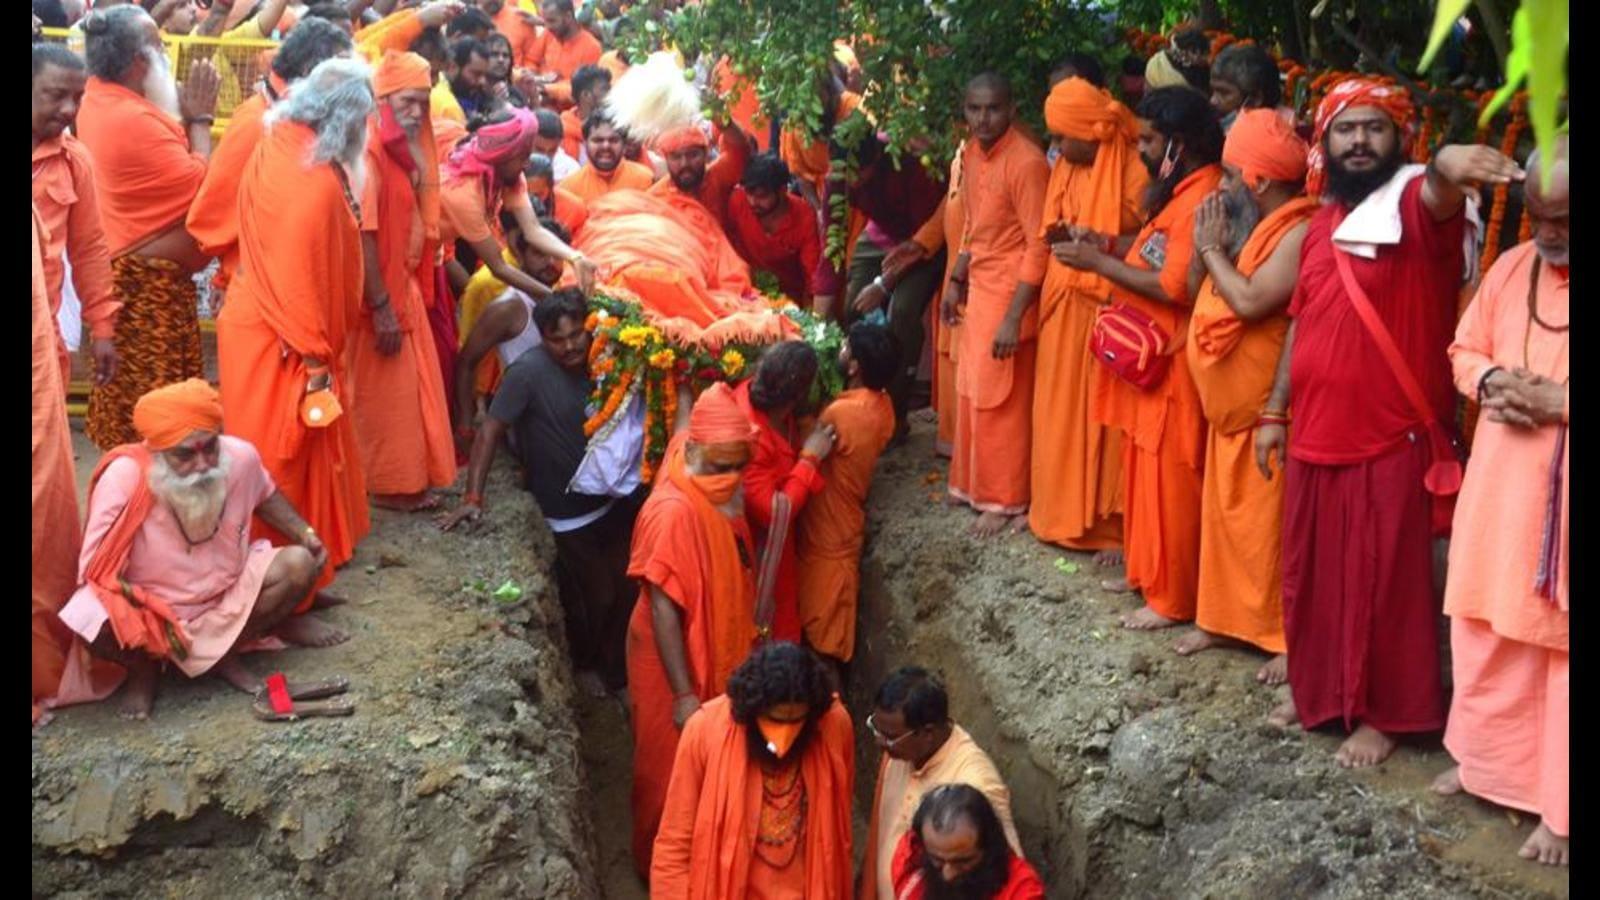 Thousands pay last respects as mahant Giri given Bhu Samadhi